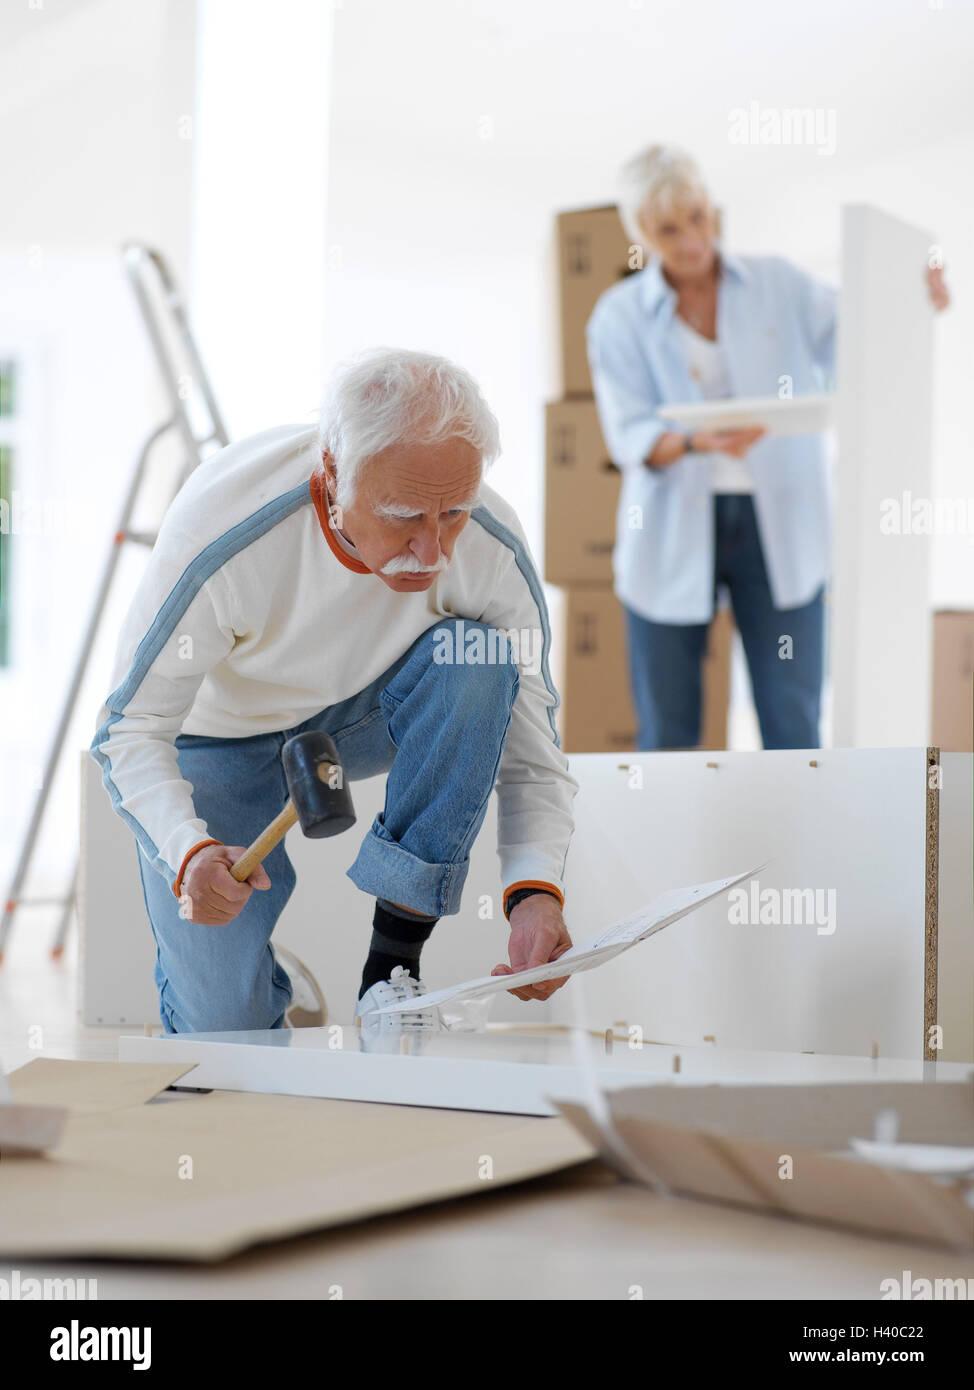 montieren anleitung best montieren anleitung with montieren anleitung trendy anleitung. Black Bedroom Furniture Sets. Home Design Ideas